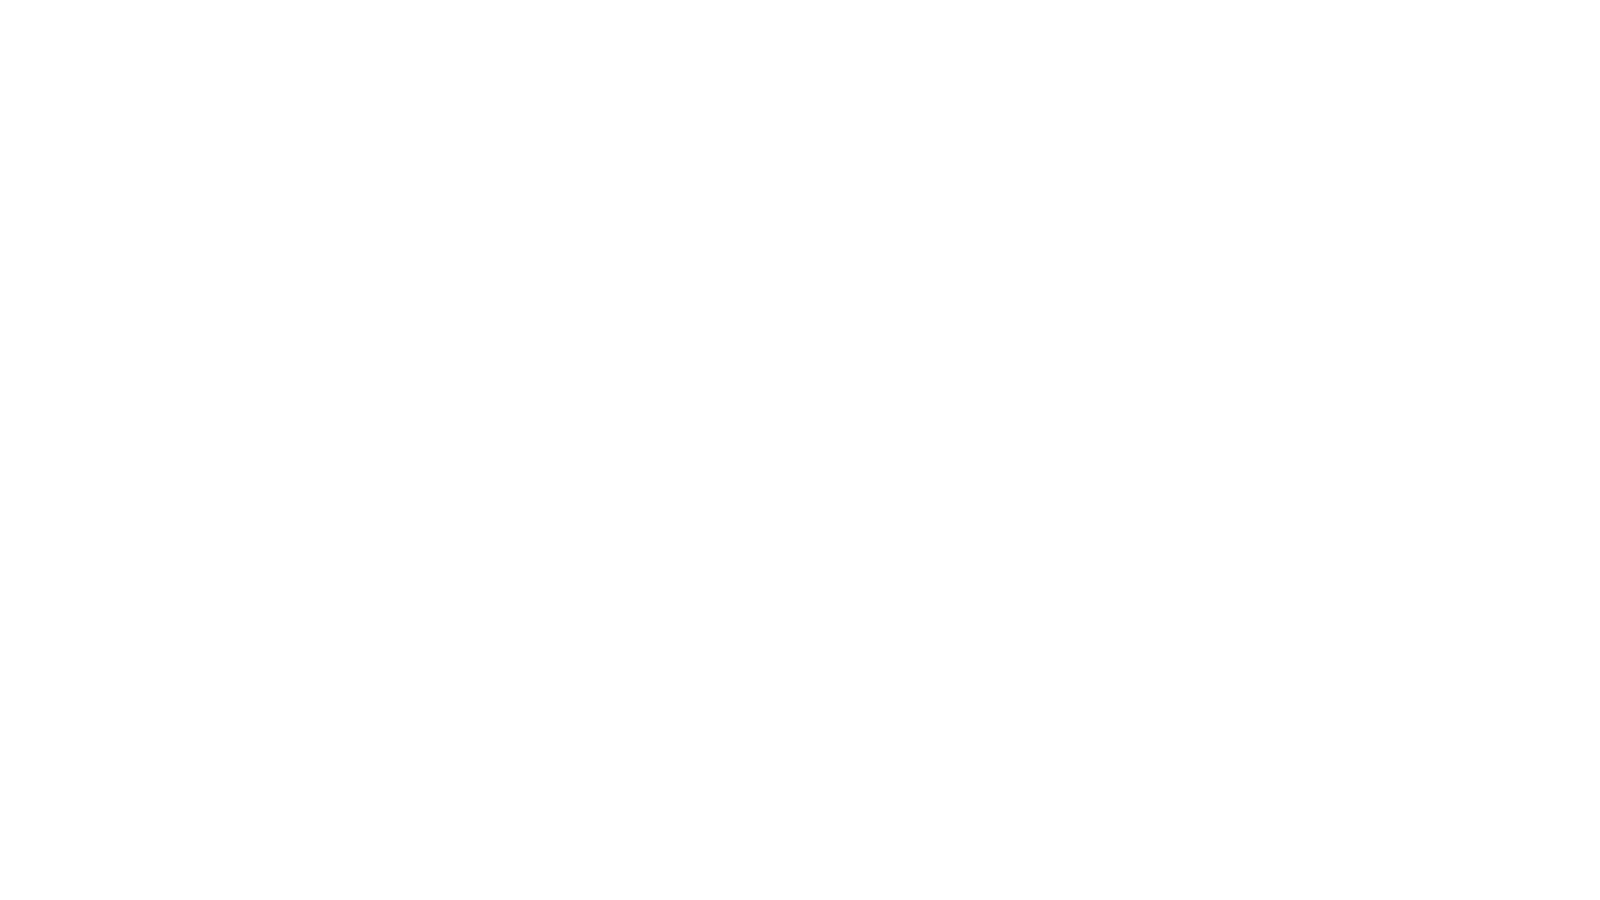 "Rakkatak is releasing the single ""The Passenger with Char Taal"" for International Women's Day 2021.  Video by Daniel Zahalka  Pre-order the album and download the single at  https://rakkatak.bandcamp.com/album/char-taal-and-a-raga-rainbow   On the track:  Anita Katakkar: tabla Oriana Barbato: electric bass Pratik Rao: vocals Zaynab Wilson: cajón Jessica Hana Deutsch: violin arrangement and playing  Recording at St Clarens Records with Patric McGroarty  Mixing by Reza Moghaddas Production by Anita Katakkar Mastering by Andy Krehm Art and Design by Howie Shia   http://www.rakkatak.com"